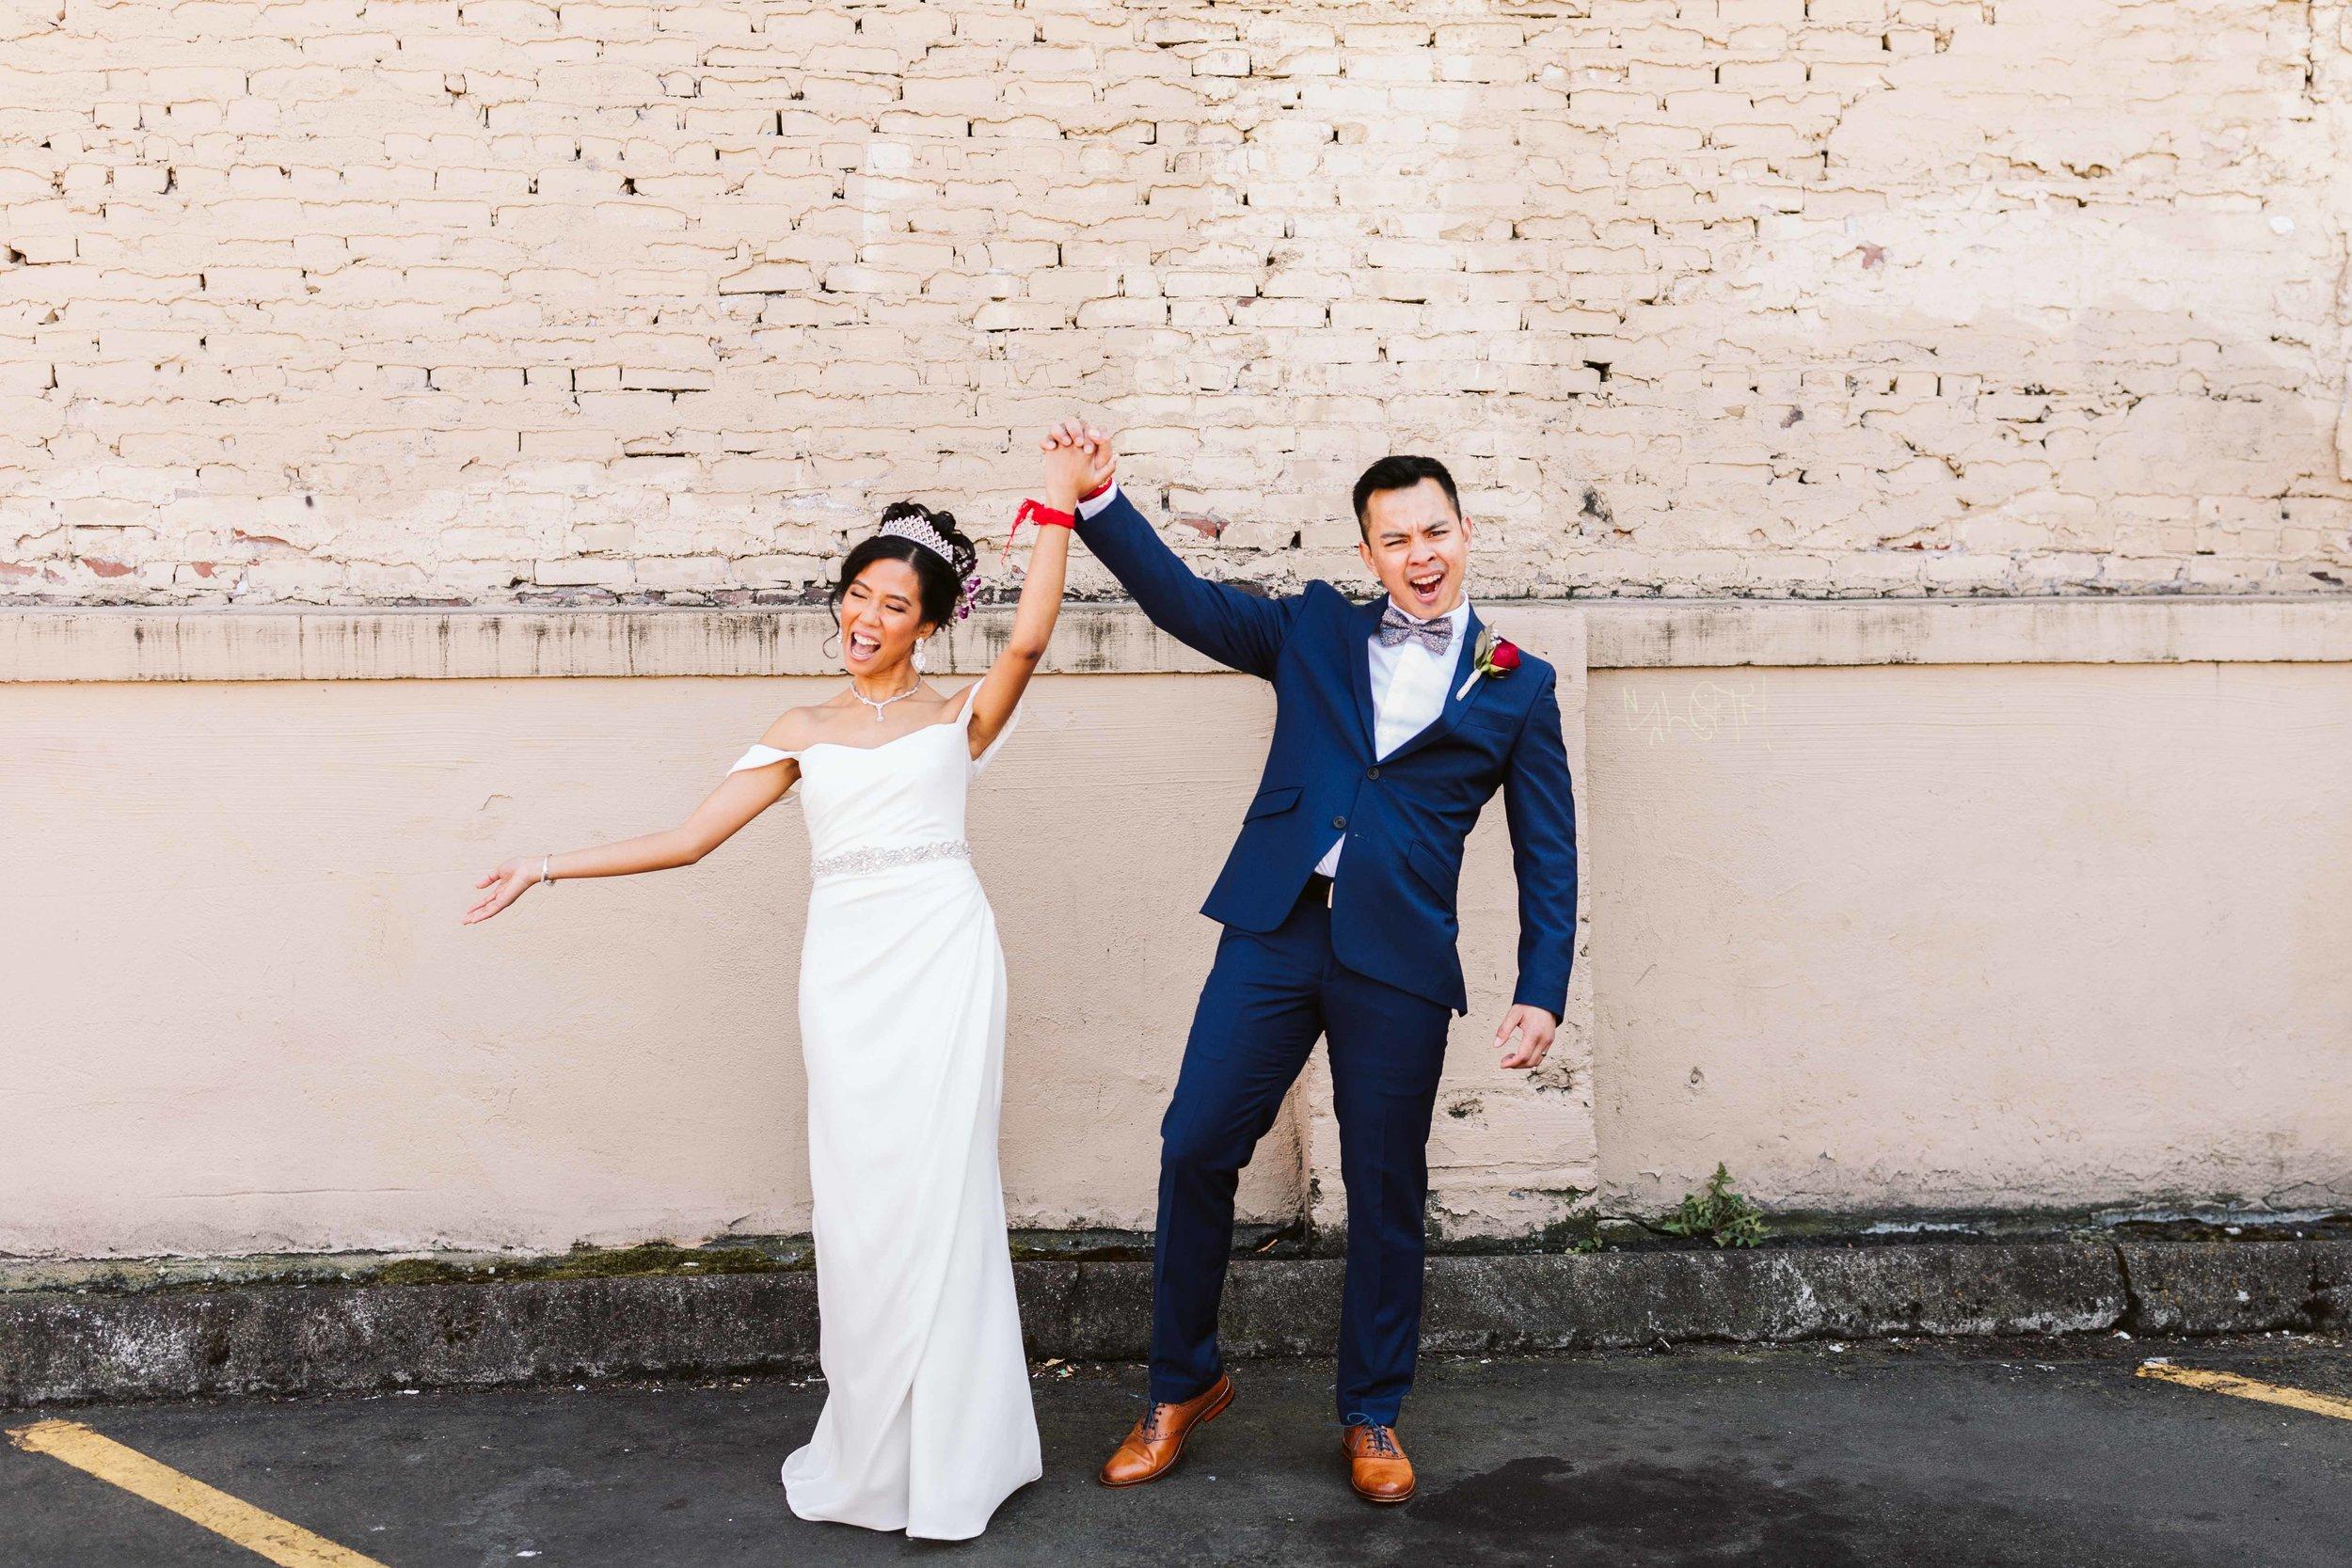 melody-ballroom-portland-wedding-78.jpg